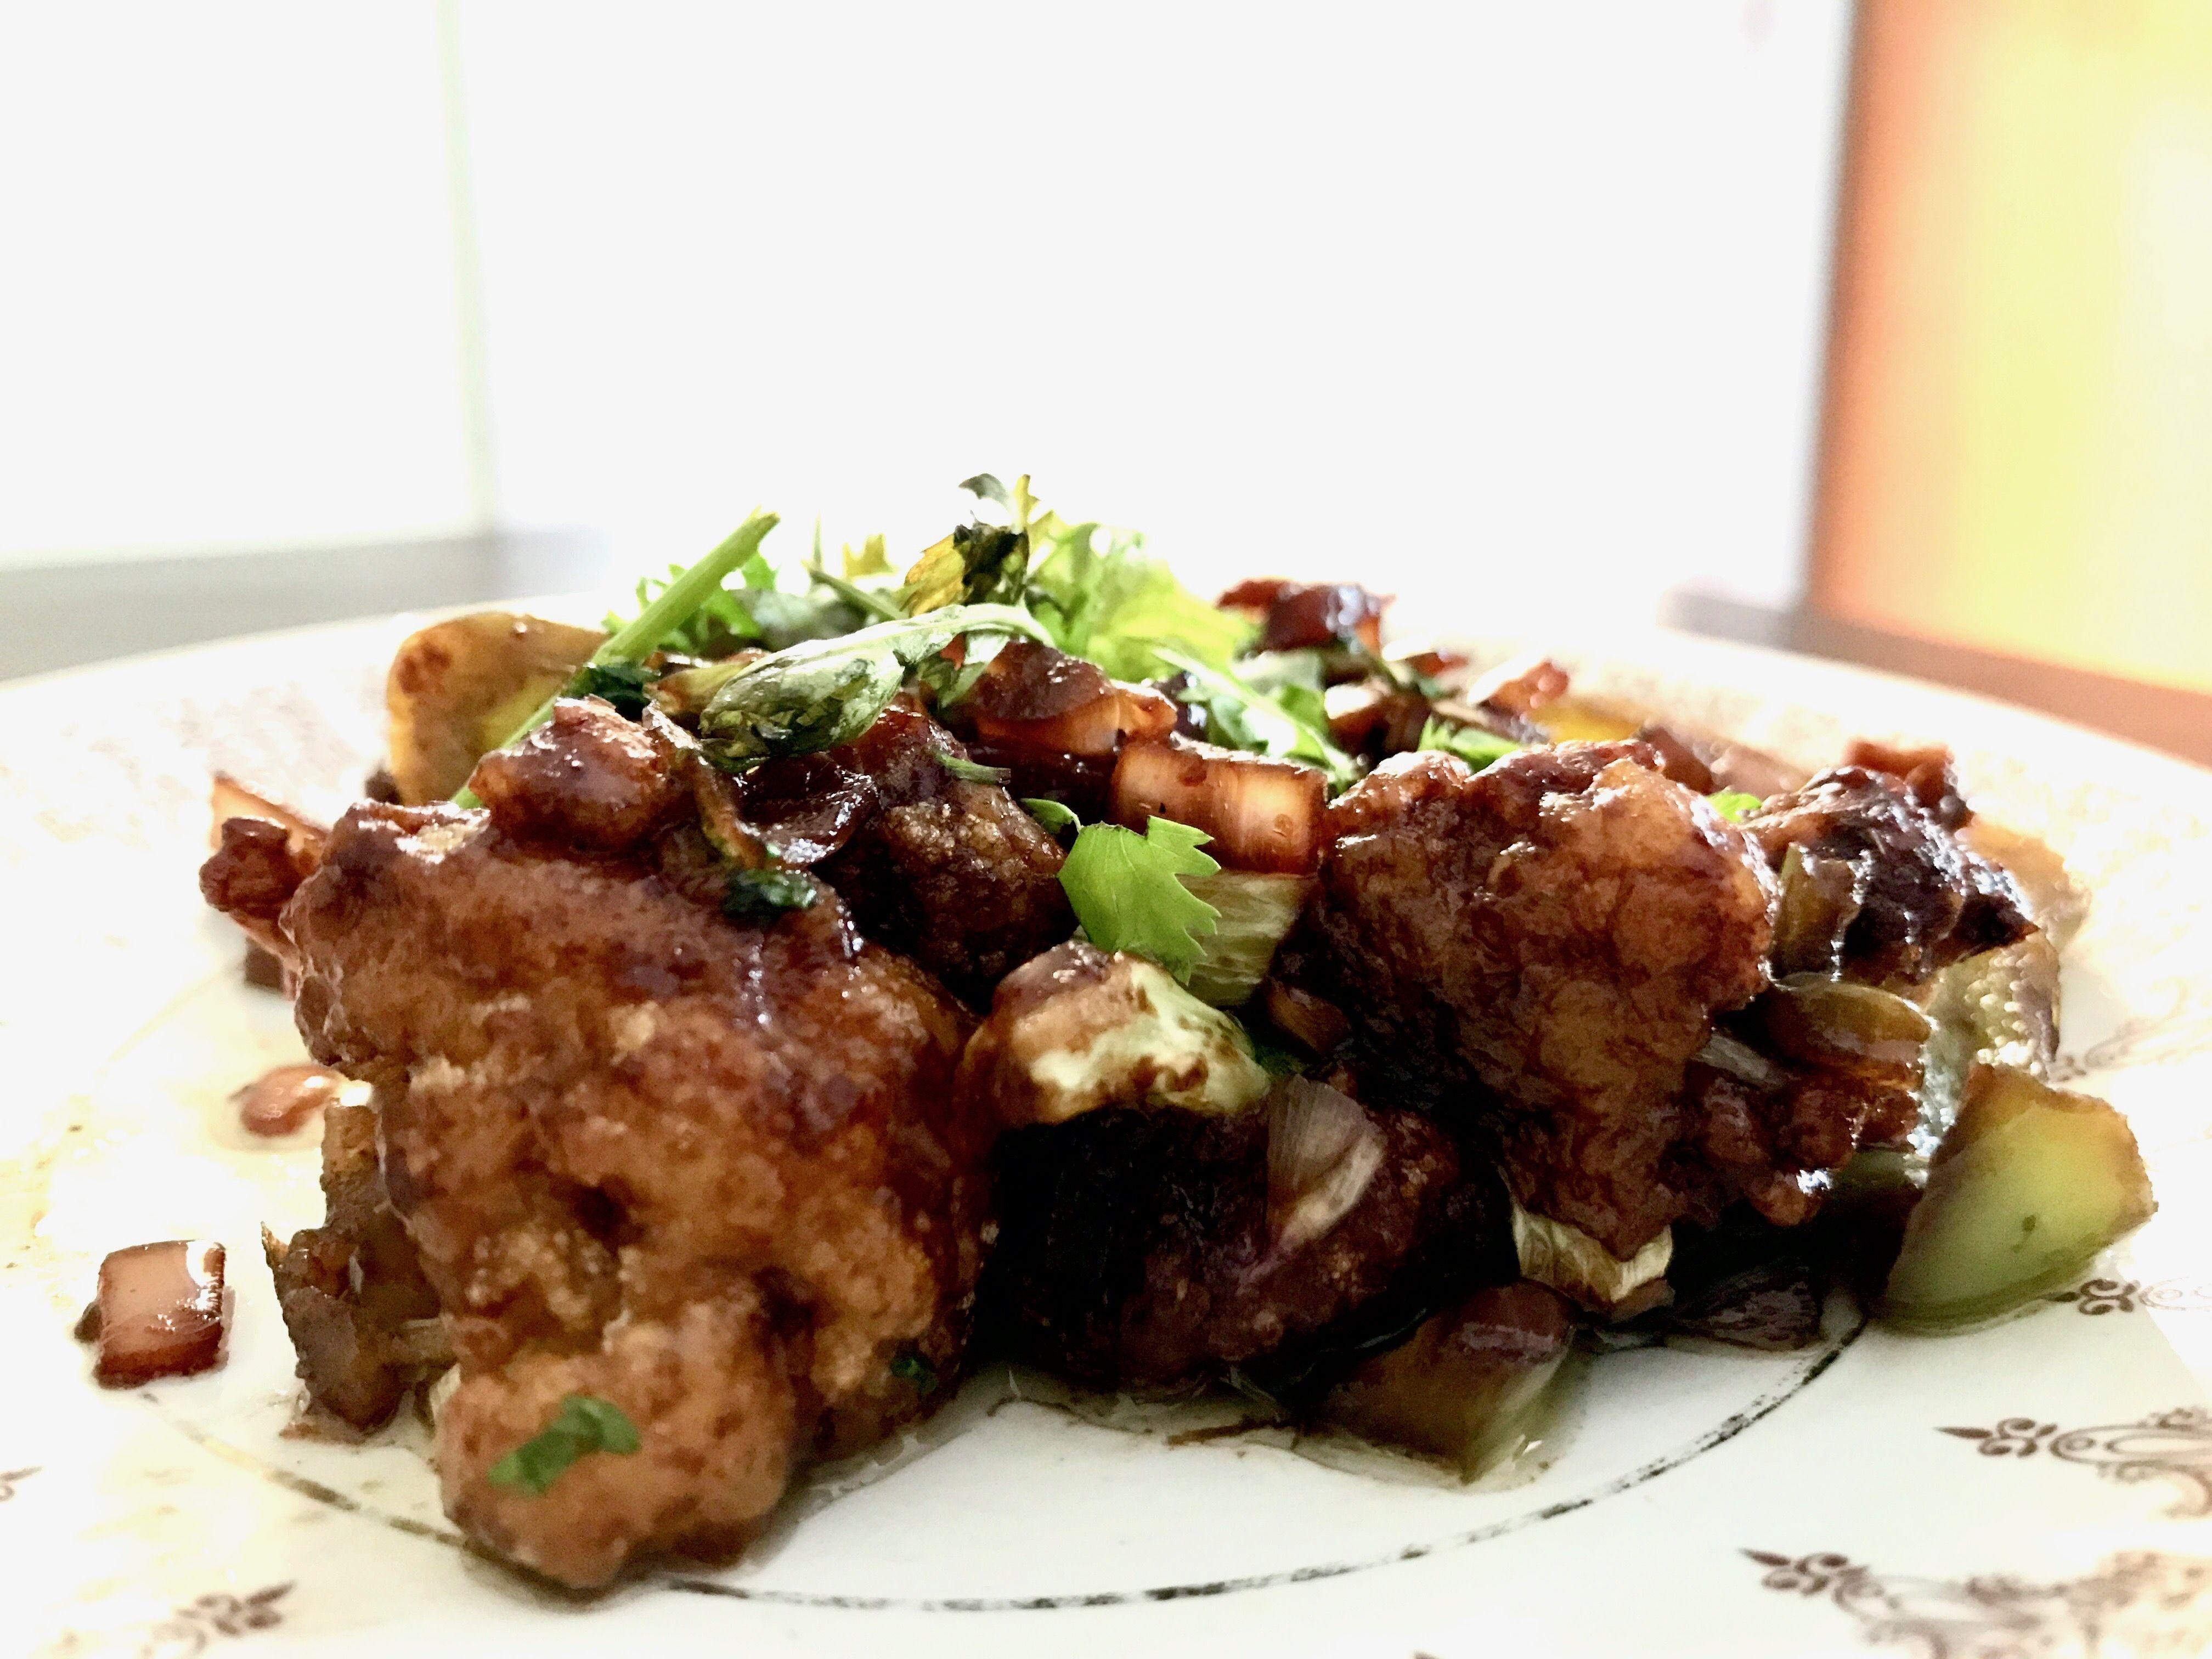 Gobi Manchurian | Gobi manchurian, Food, Beef